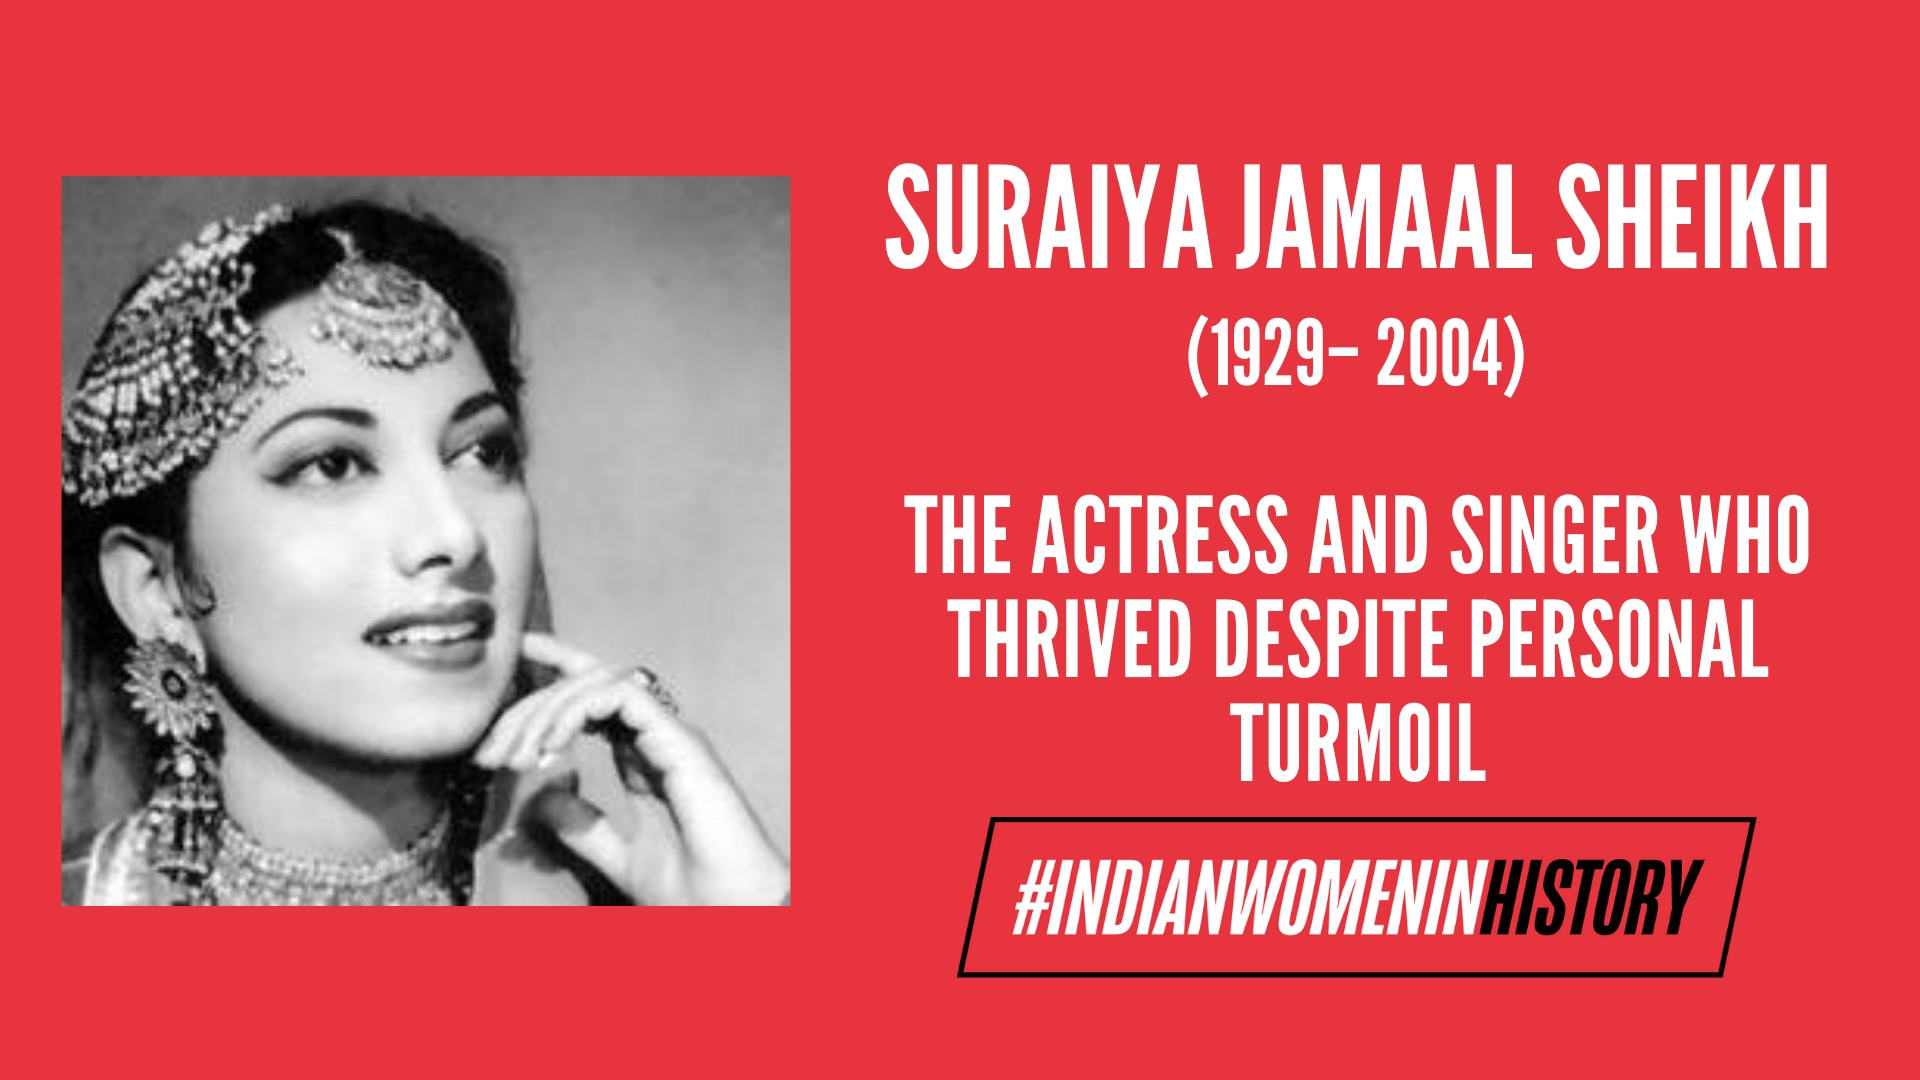 Suraiya Jamaal Sheikh: The Actress And Singer Who Thrived Despite Personal Turmoil | #IndianWomeninHistory